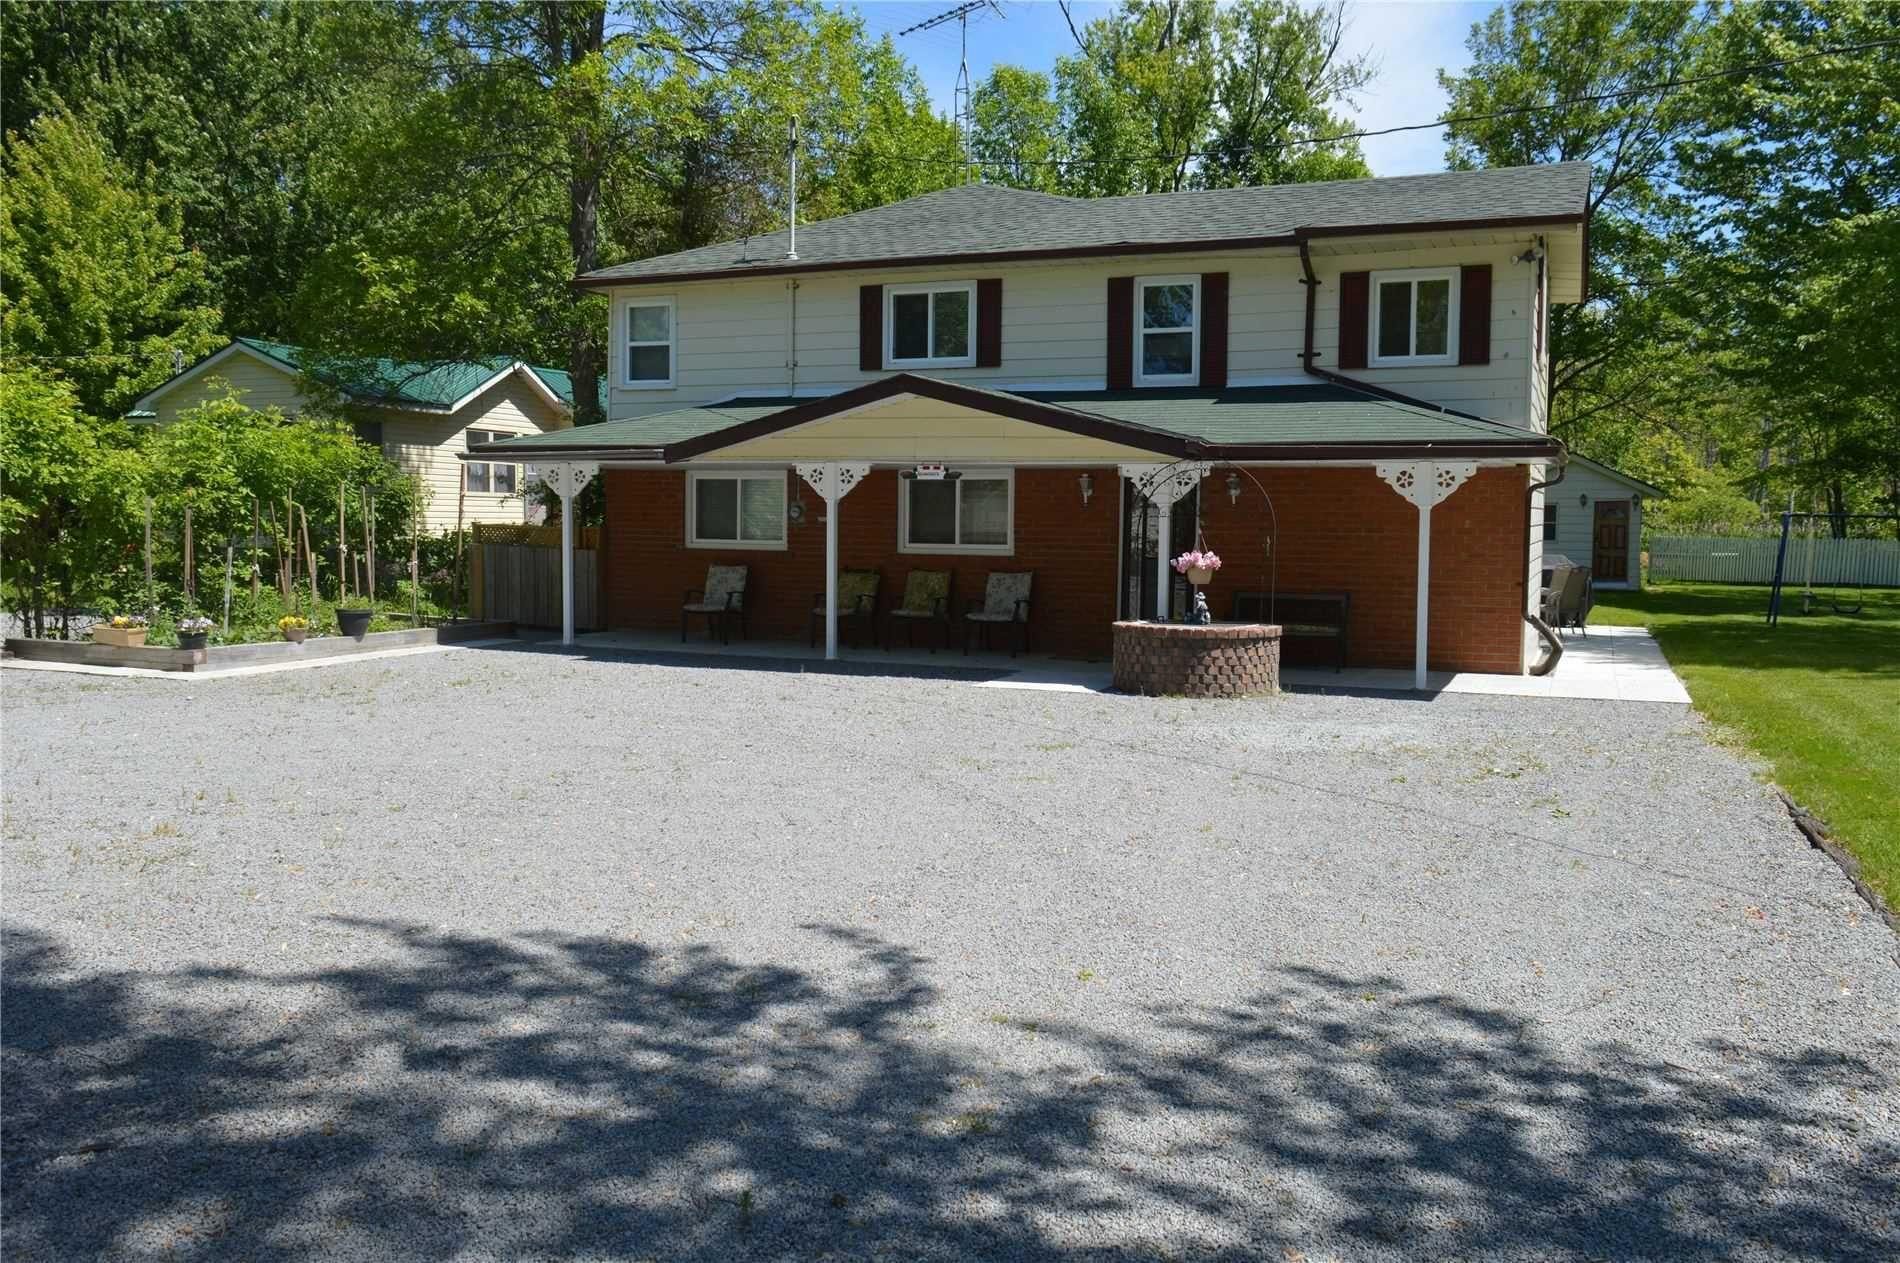 Main Photo: 2573 Lakeshore Drive in Ramara: Brechin House (2-Storey) for sale : MLS®# S5225573